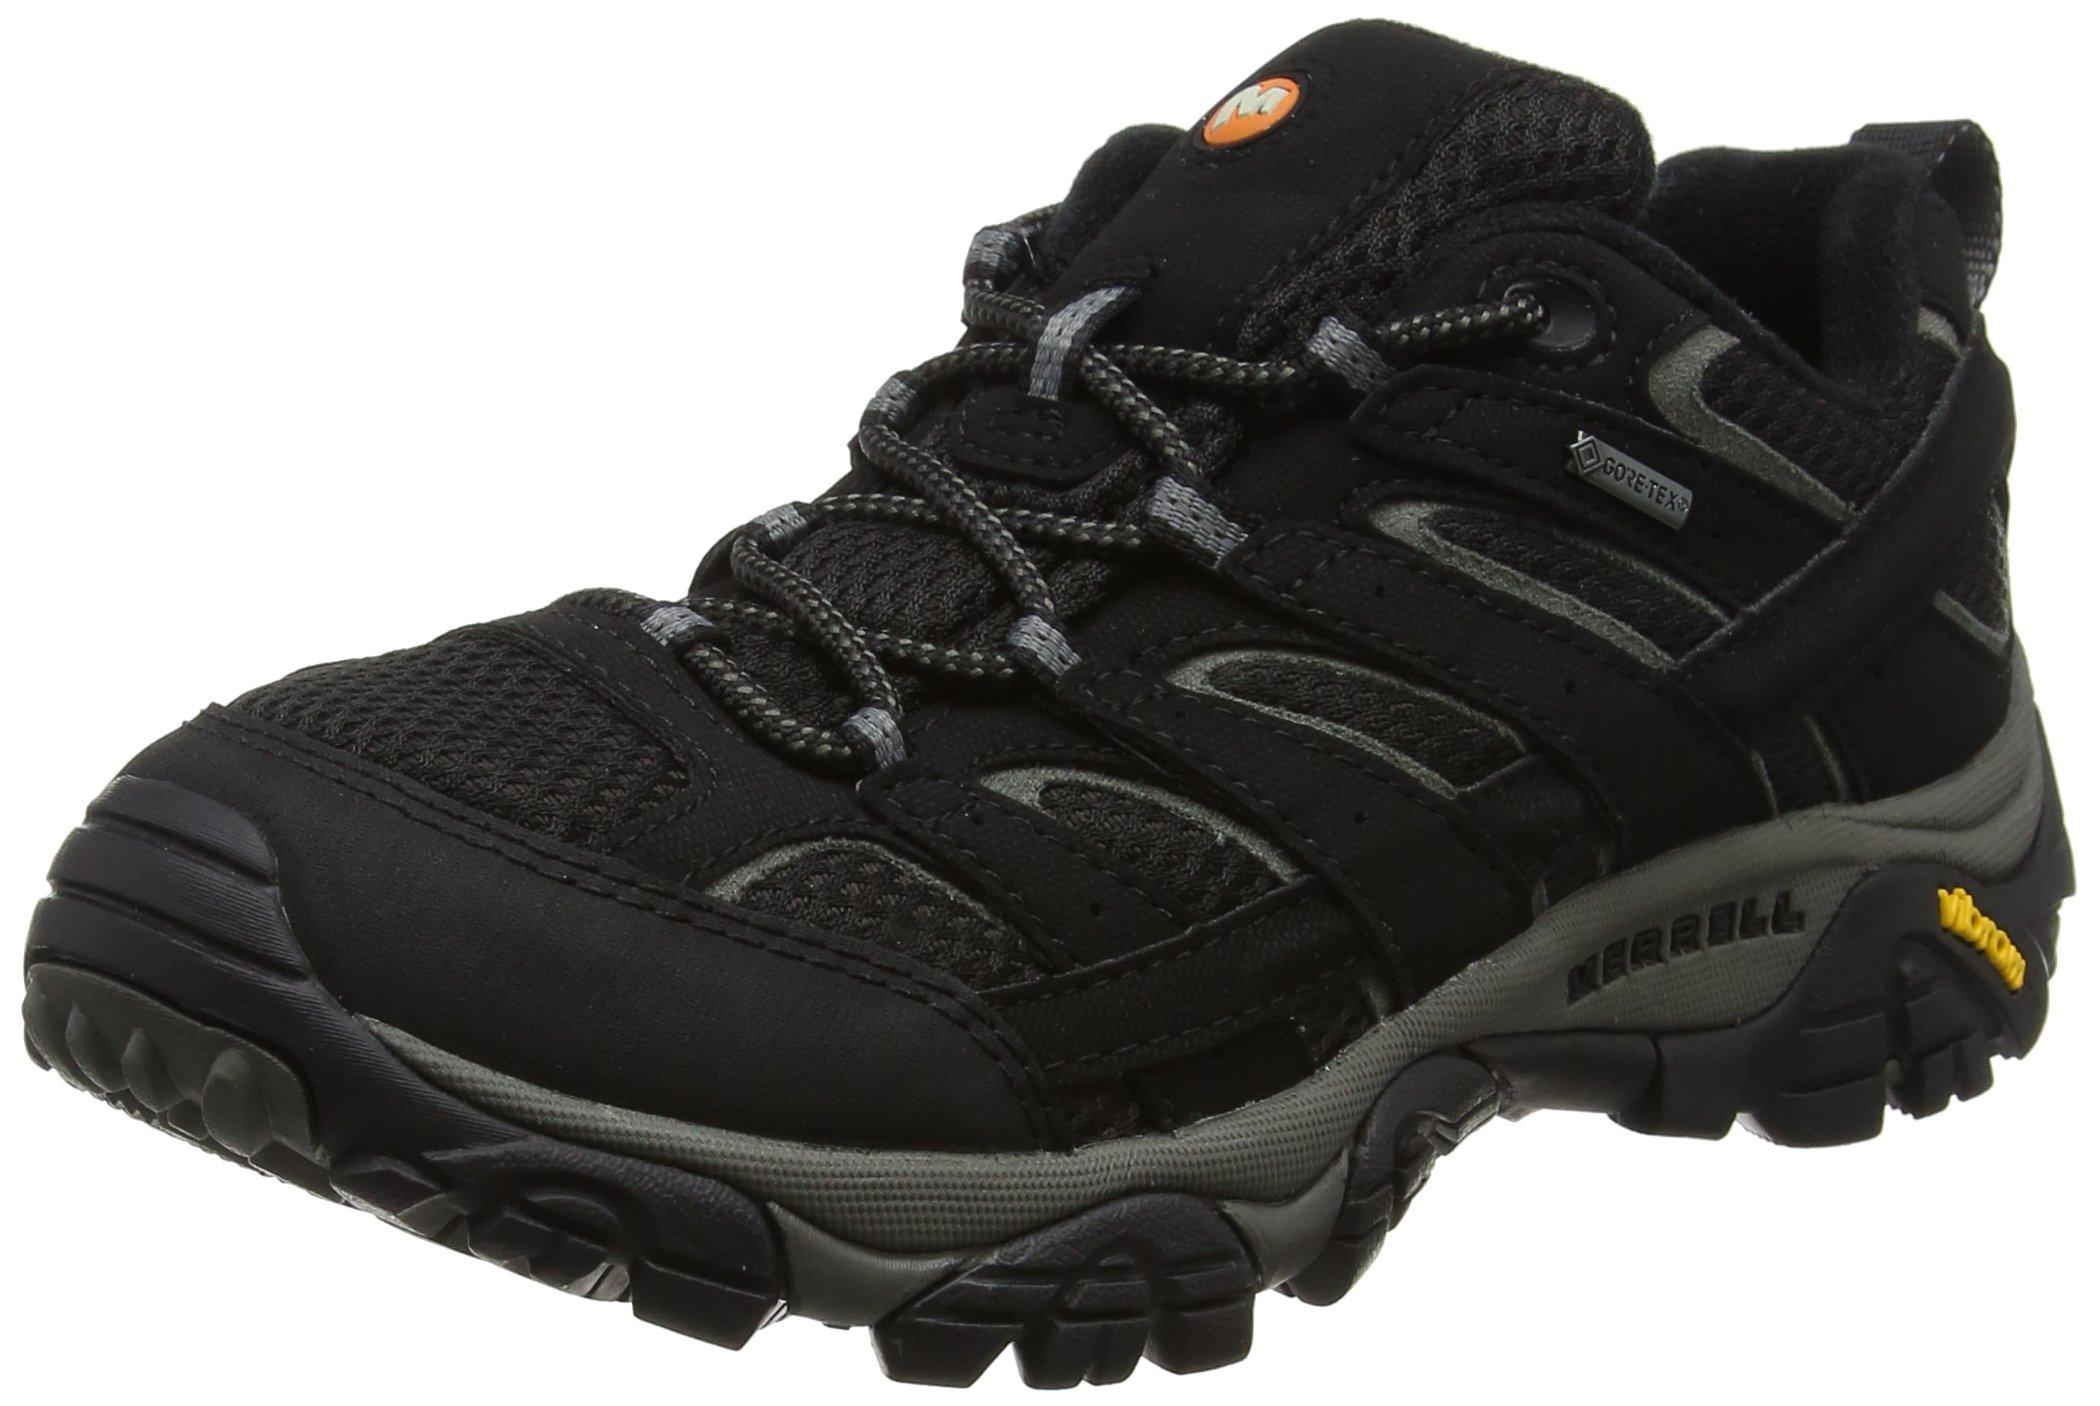 b43d2f28 Galleon - Merrell Women's Moab 2 GTX Hiking Shoe (9 B(M) US, Black)